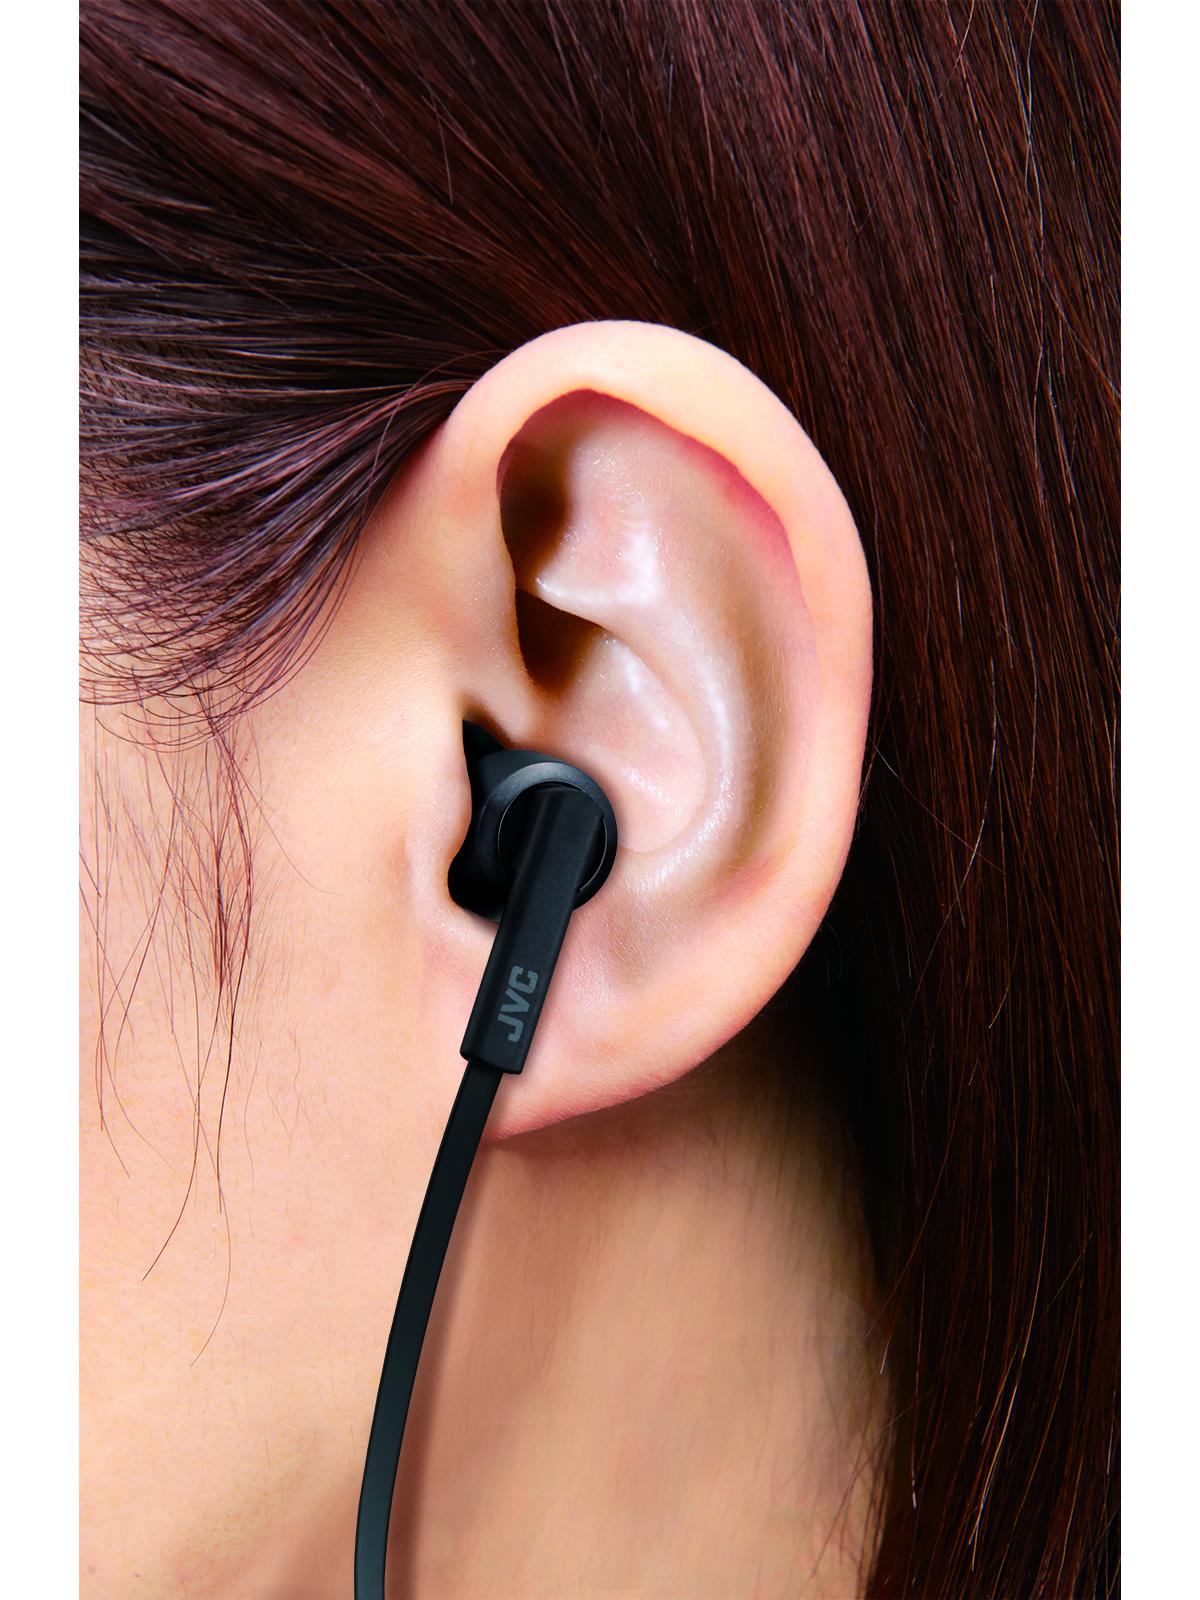 JVC lancia 6 nuove cuffie in-ear, sovraurali, cablate e wireless 2